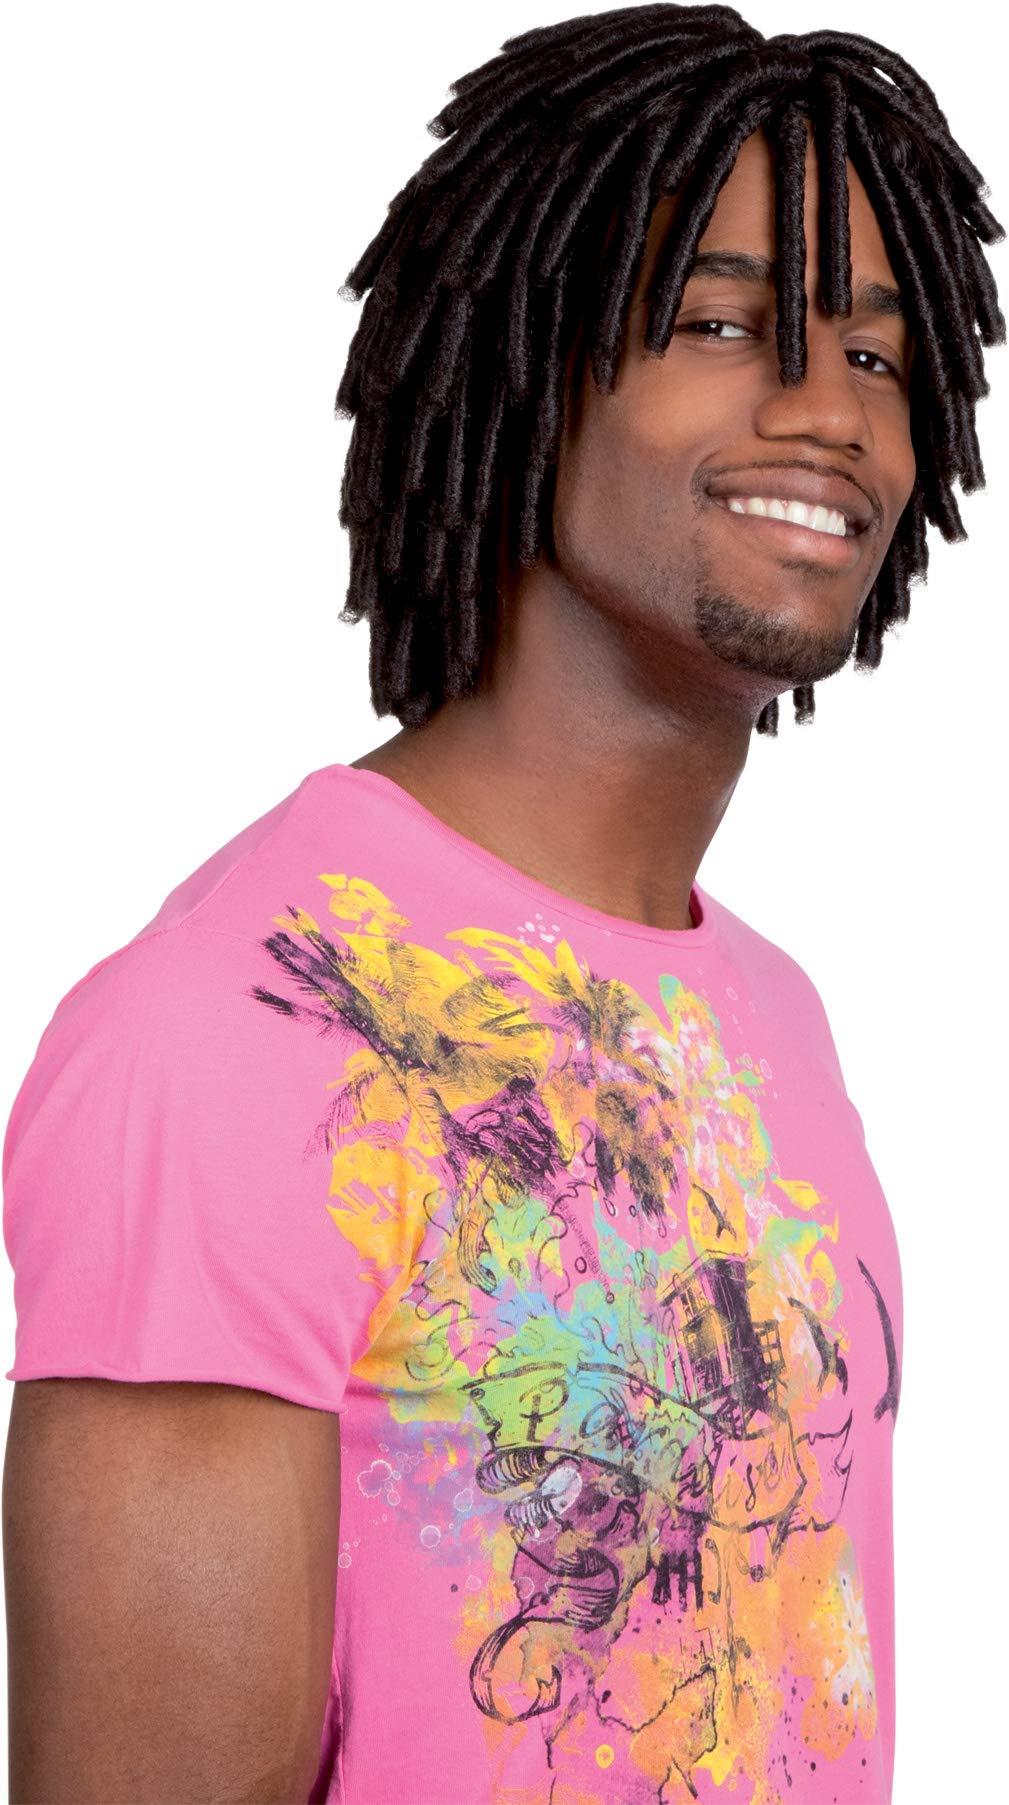 Boland 86391 Levi Jamaican Short Dreadlock Wig by Boland